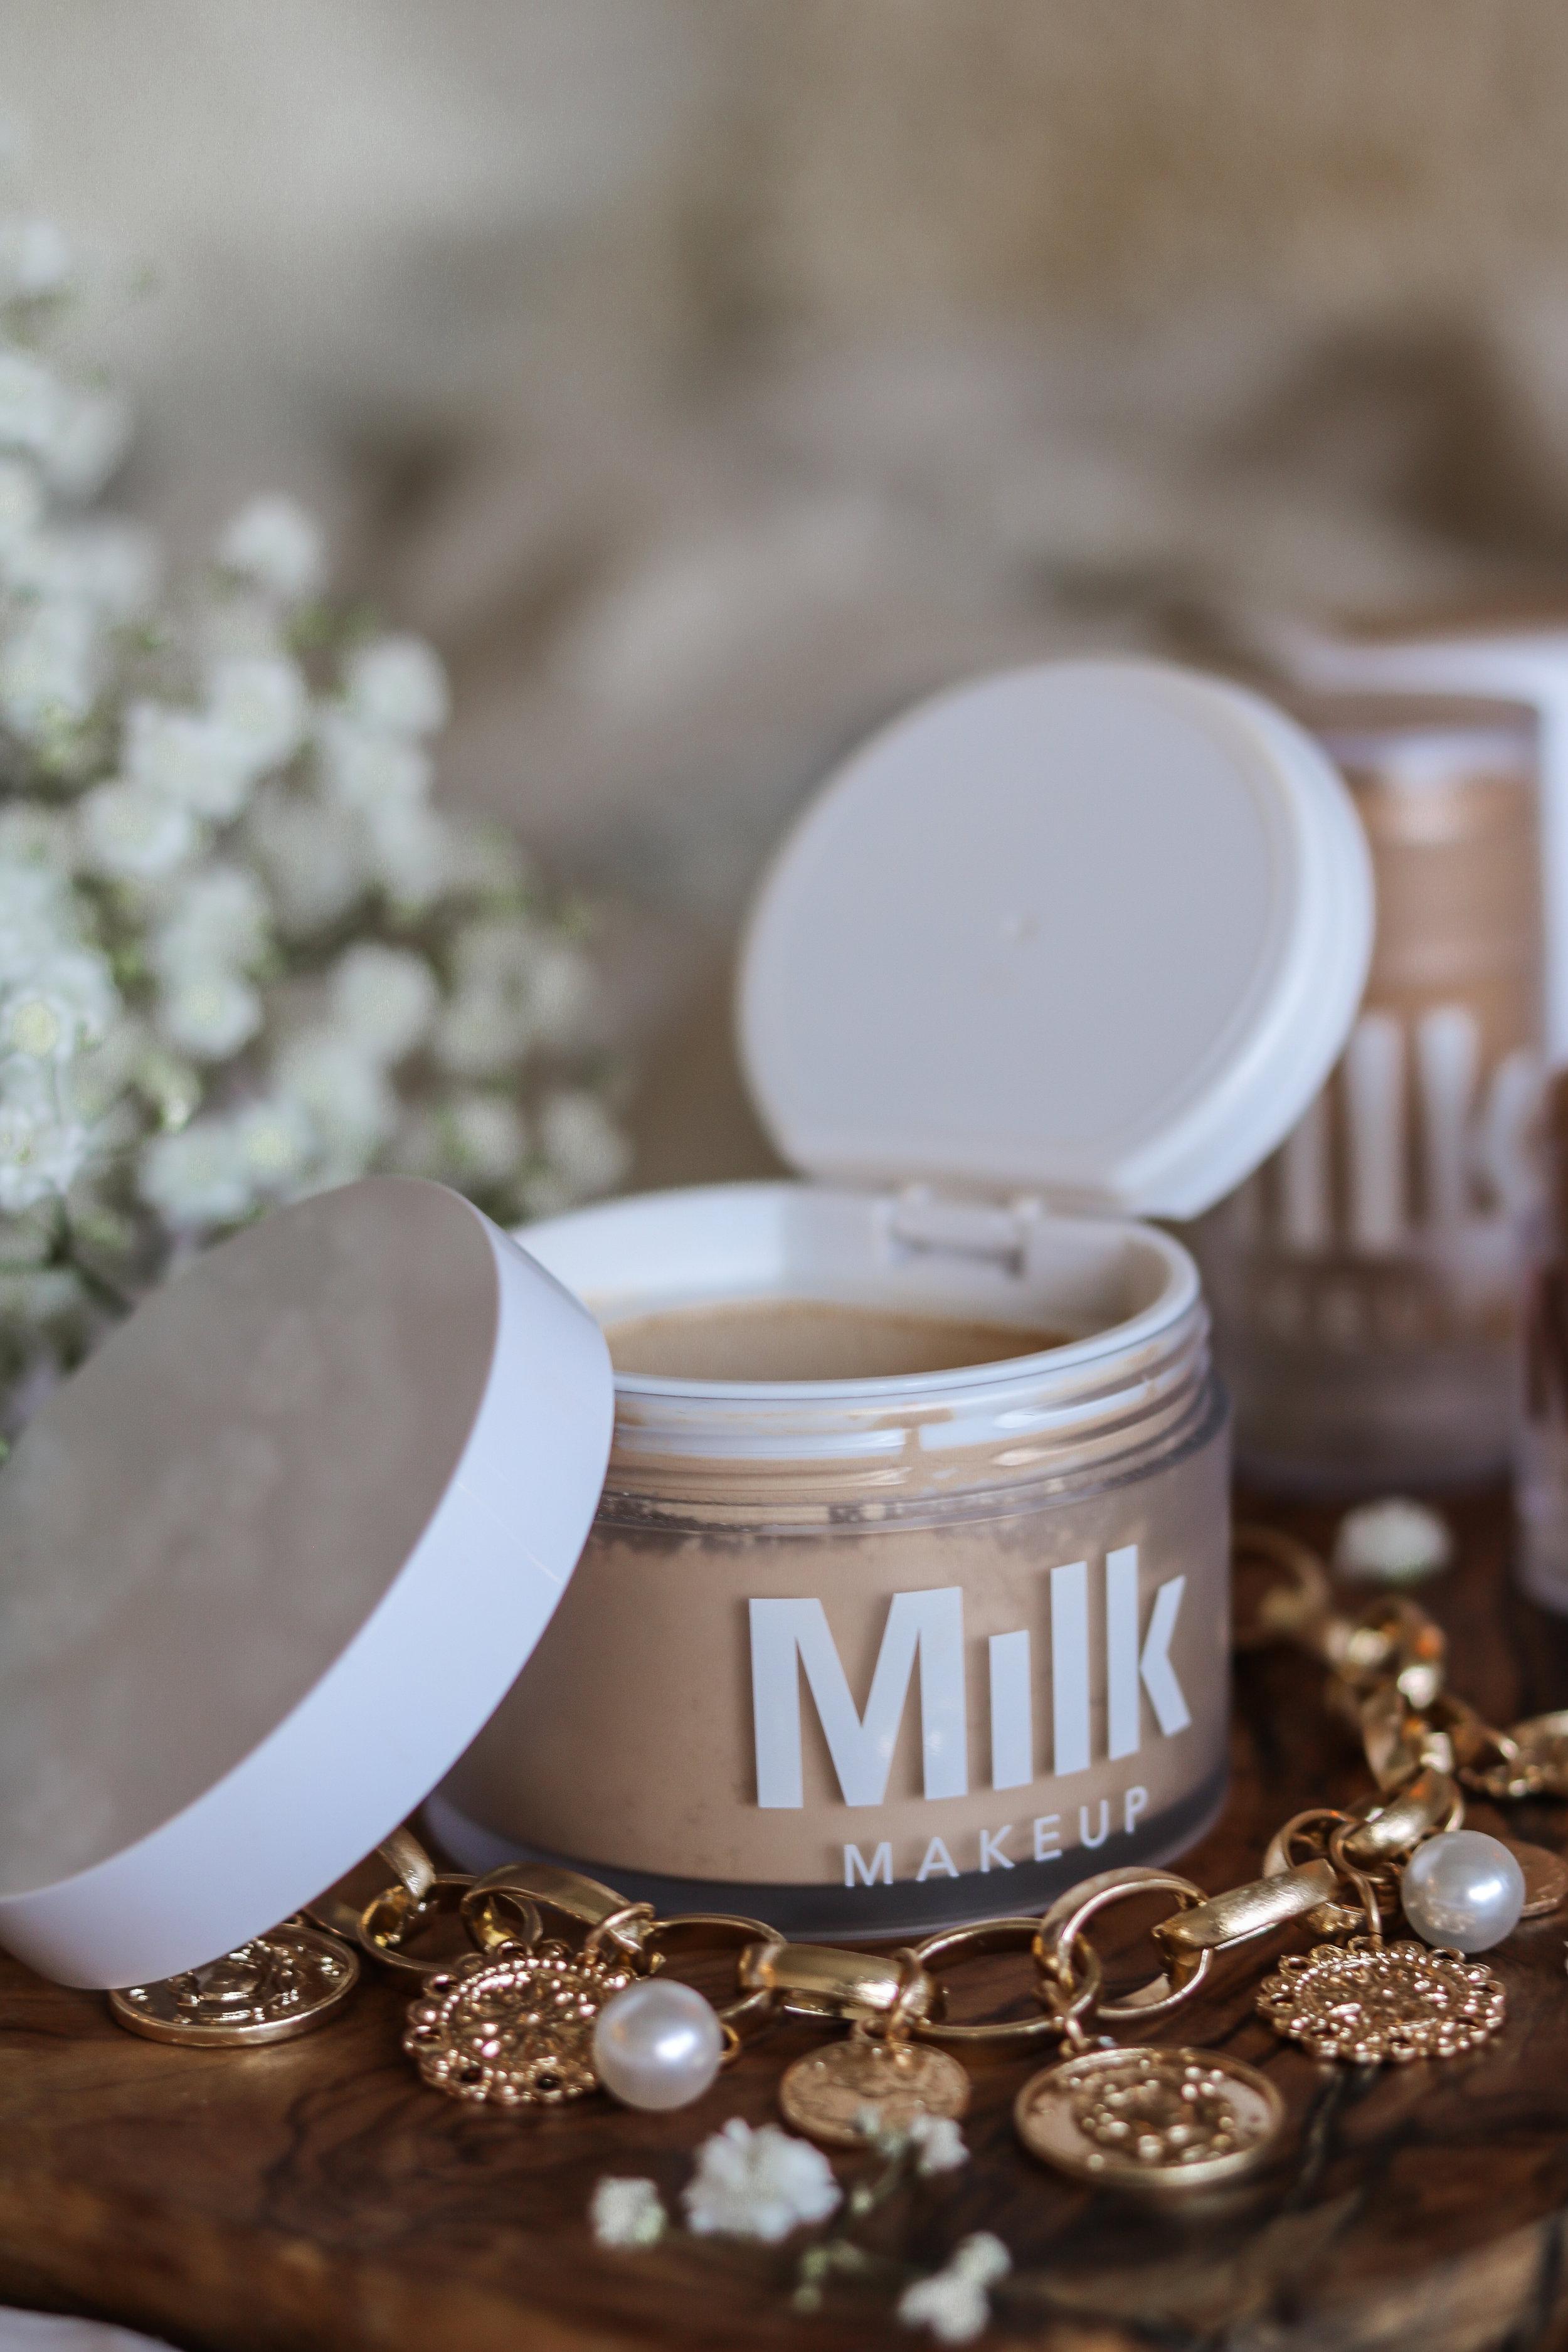 The Hungarian Brunette Milk Makeup blur + set matte loose setting powder